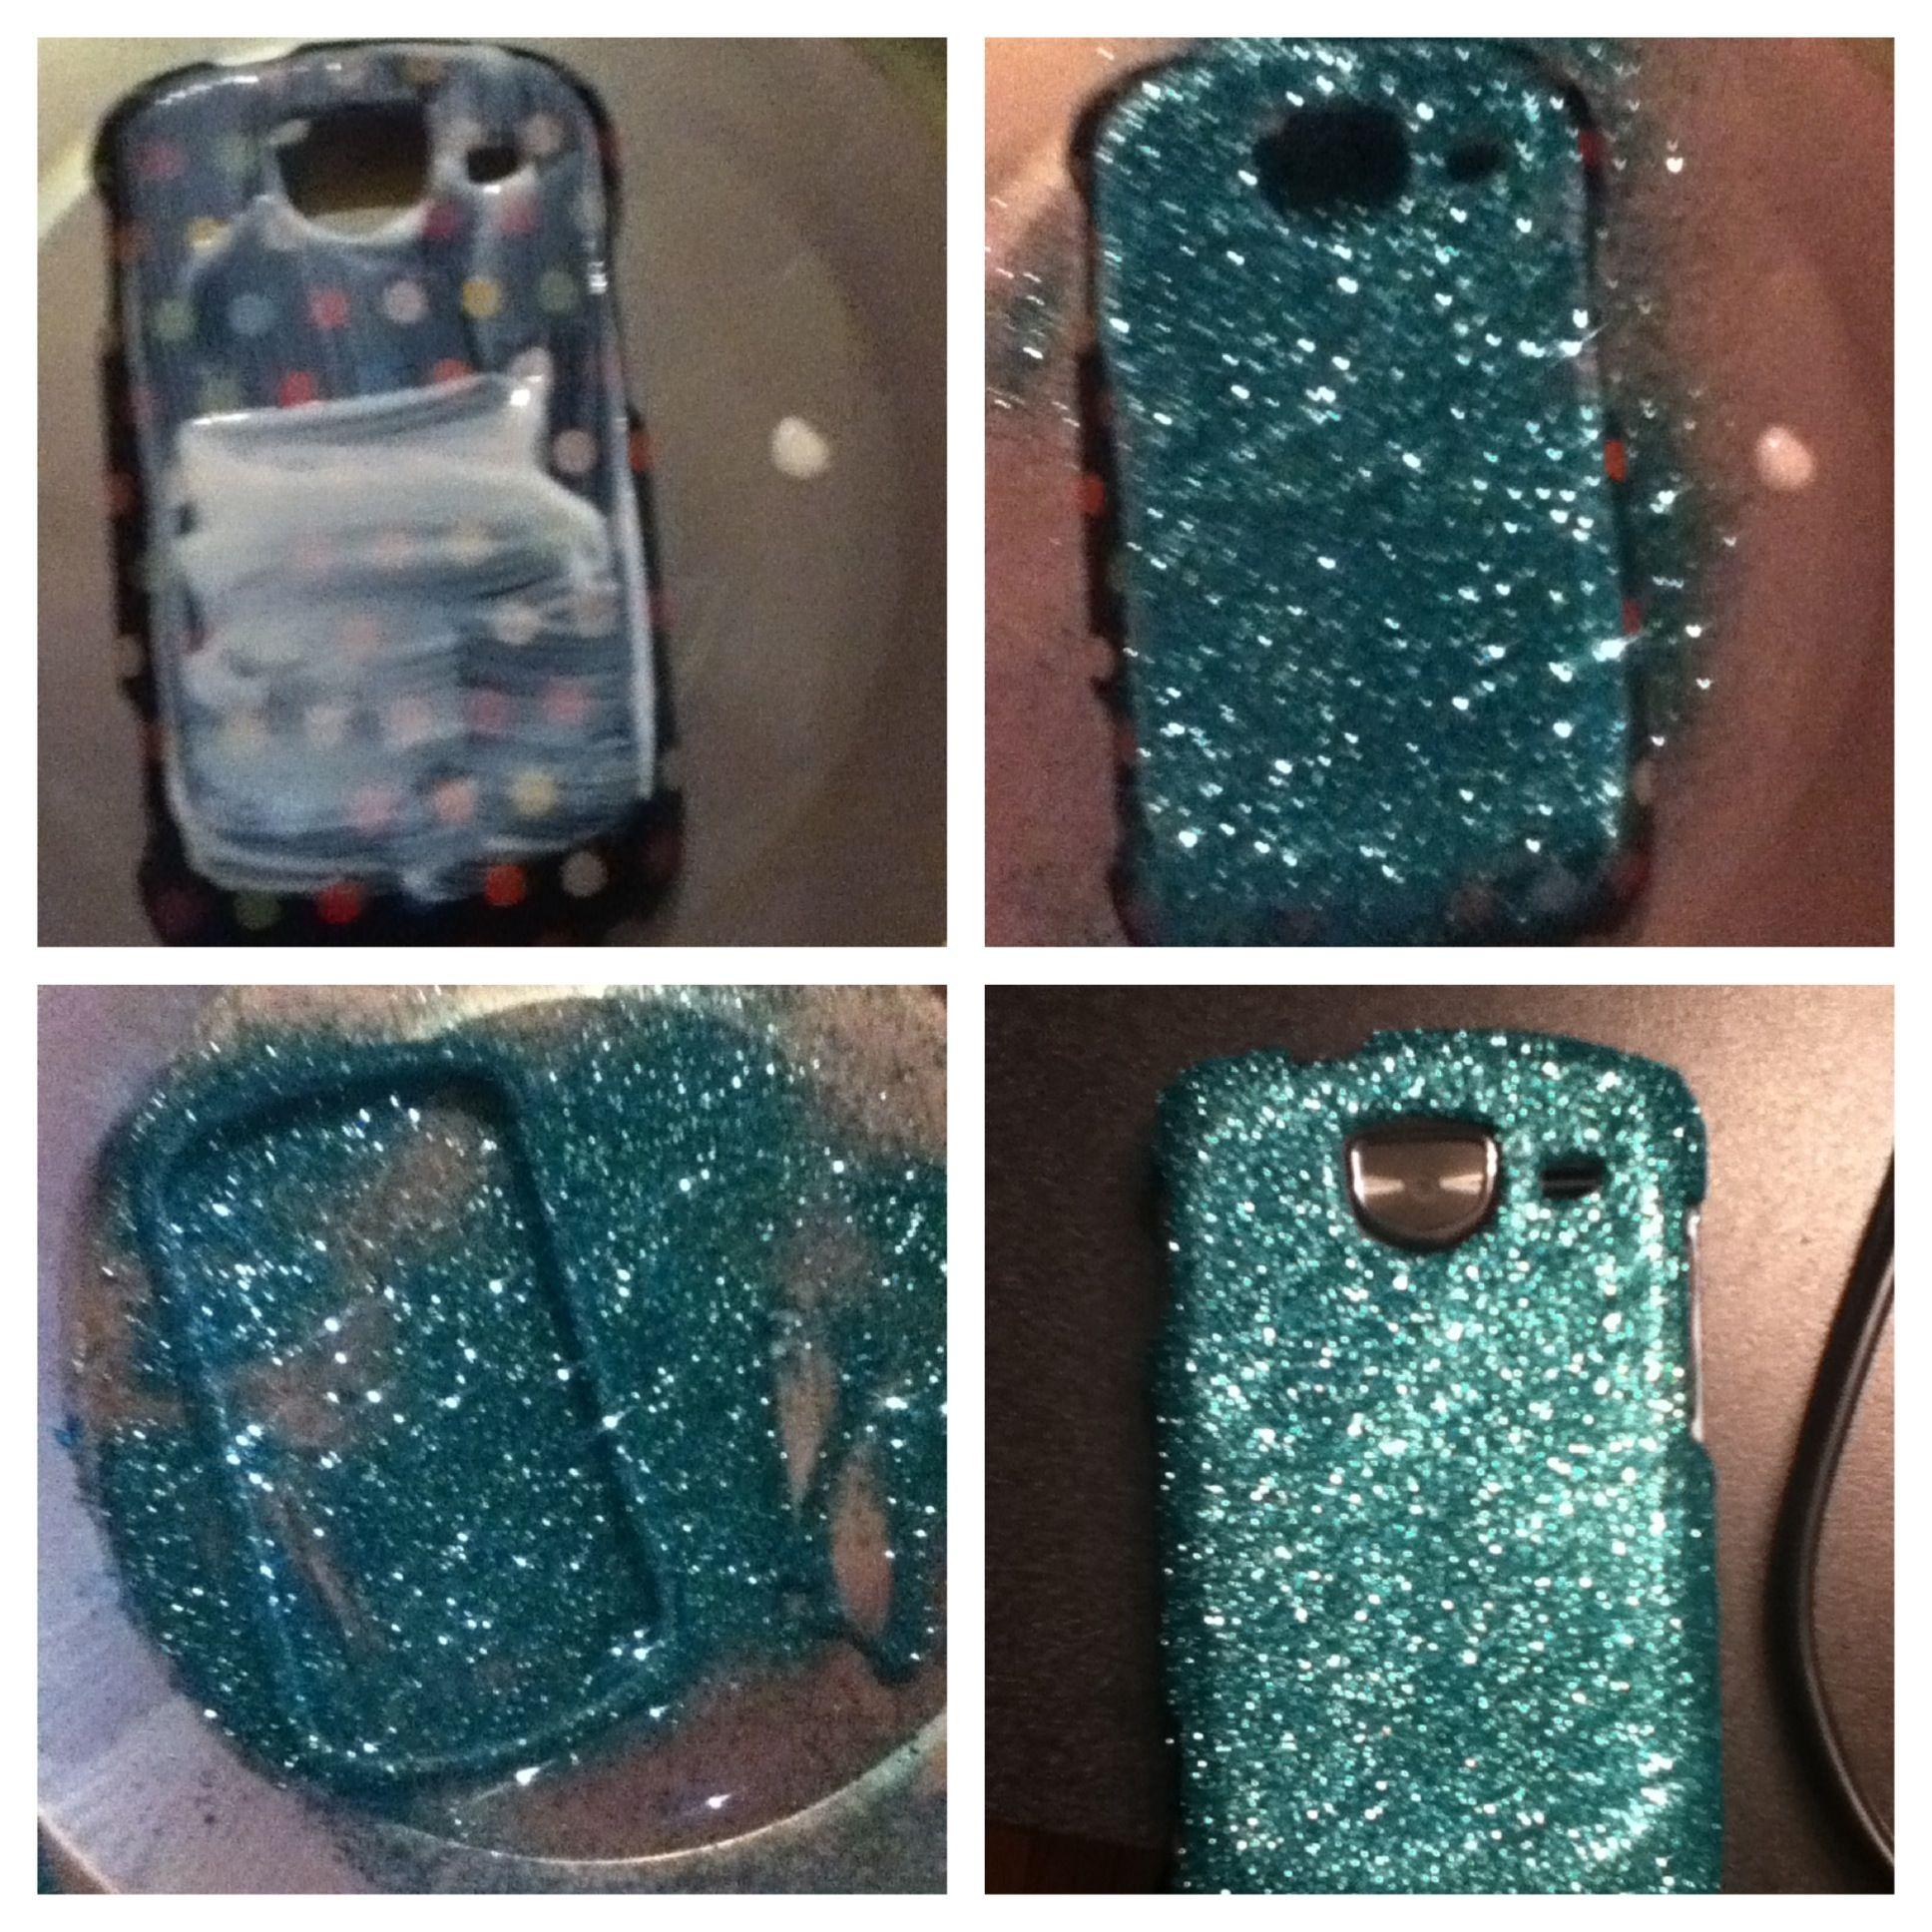 Pin By Olivia Kosloski On Crafts Diy Glitter Diy Glitter Phone Cases Mod Podge